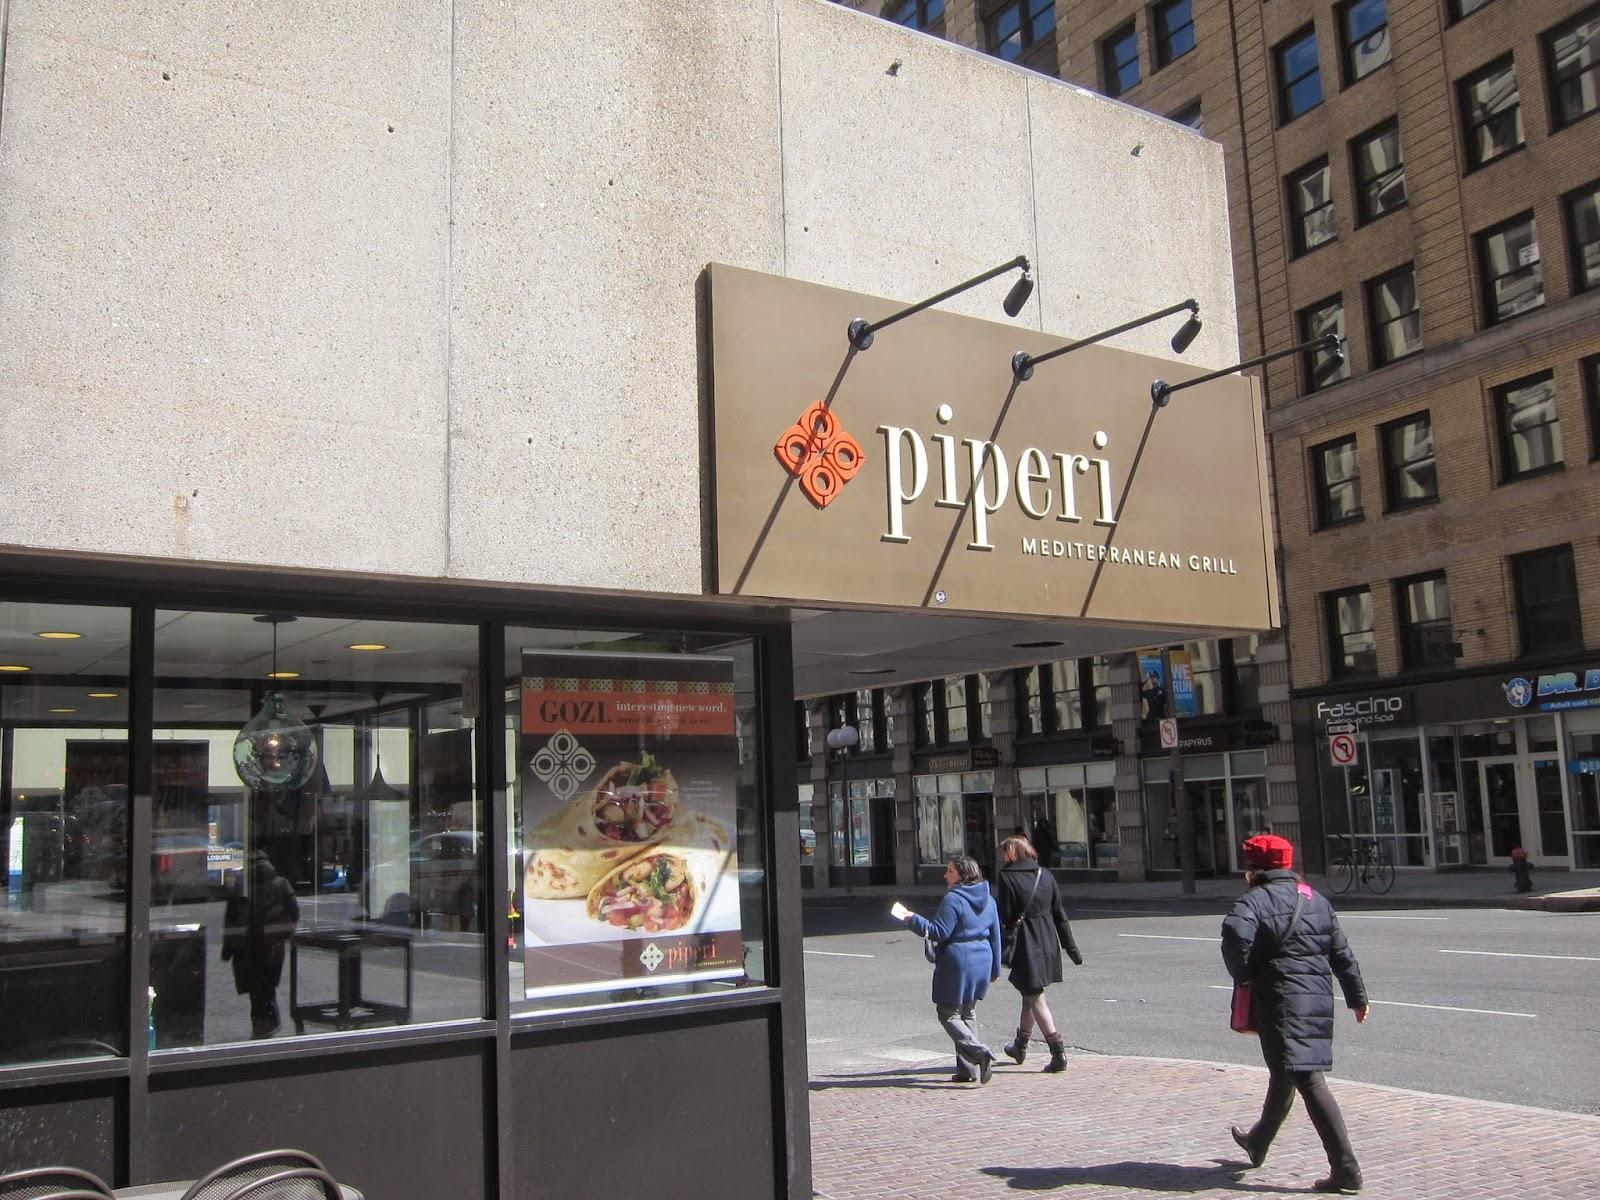 Piperi Mediterranean Grill in Boston | The Economical Eater